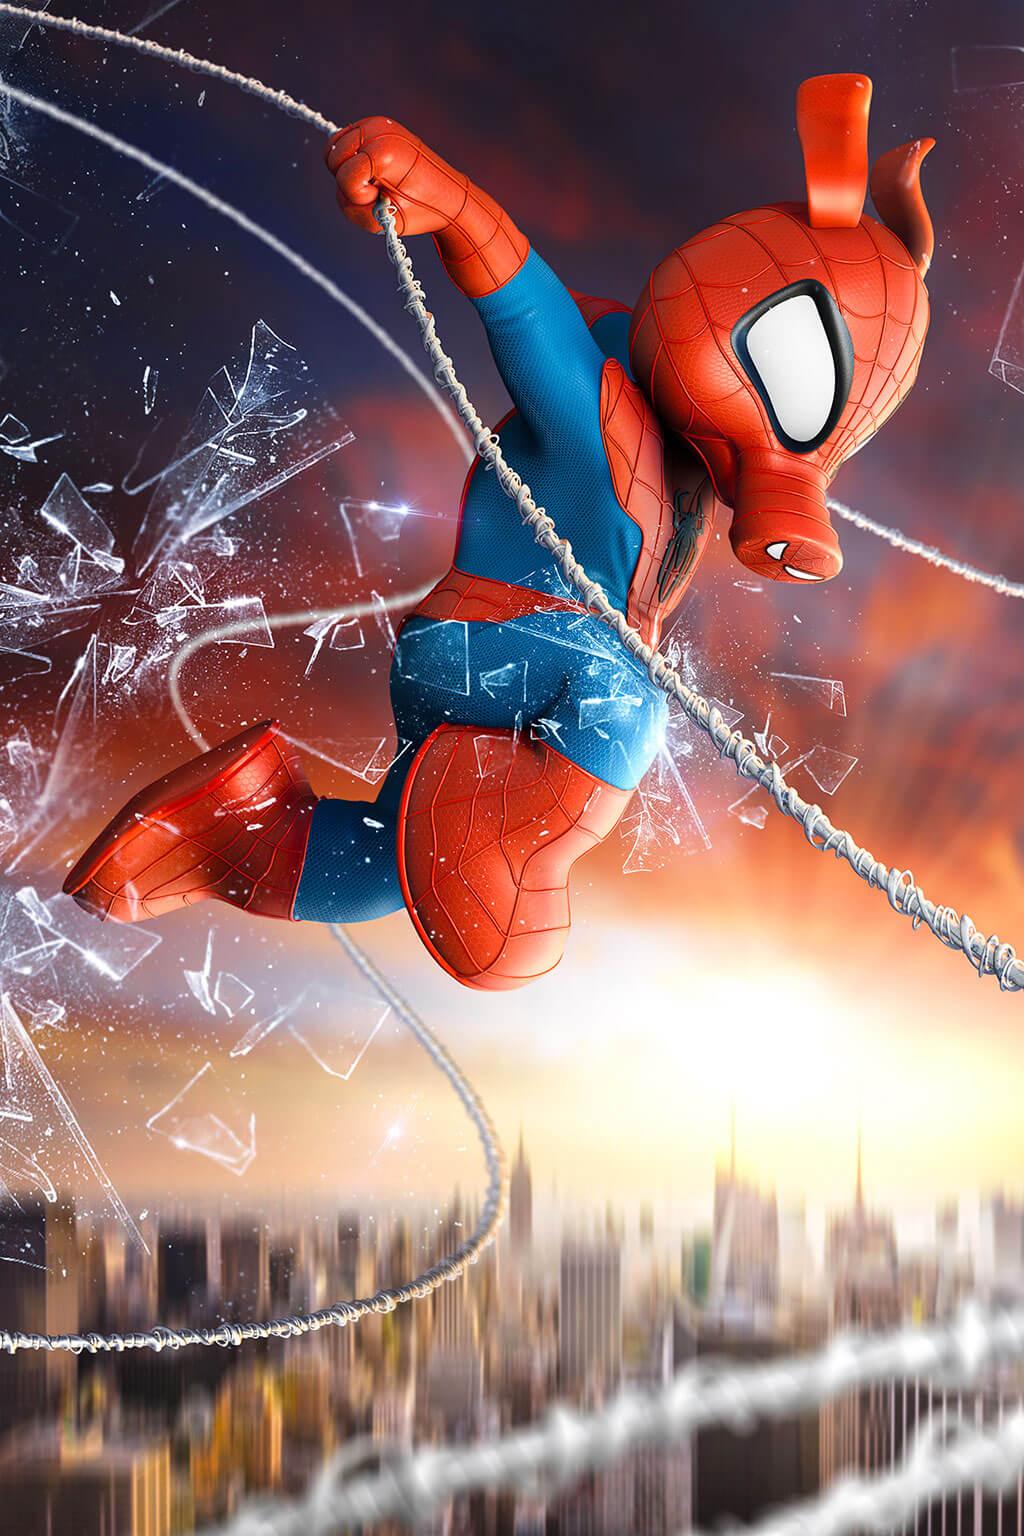 Spider-Man Fan Art by Óscar Fernández